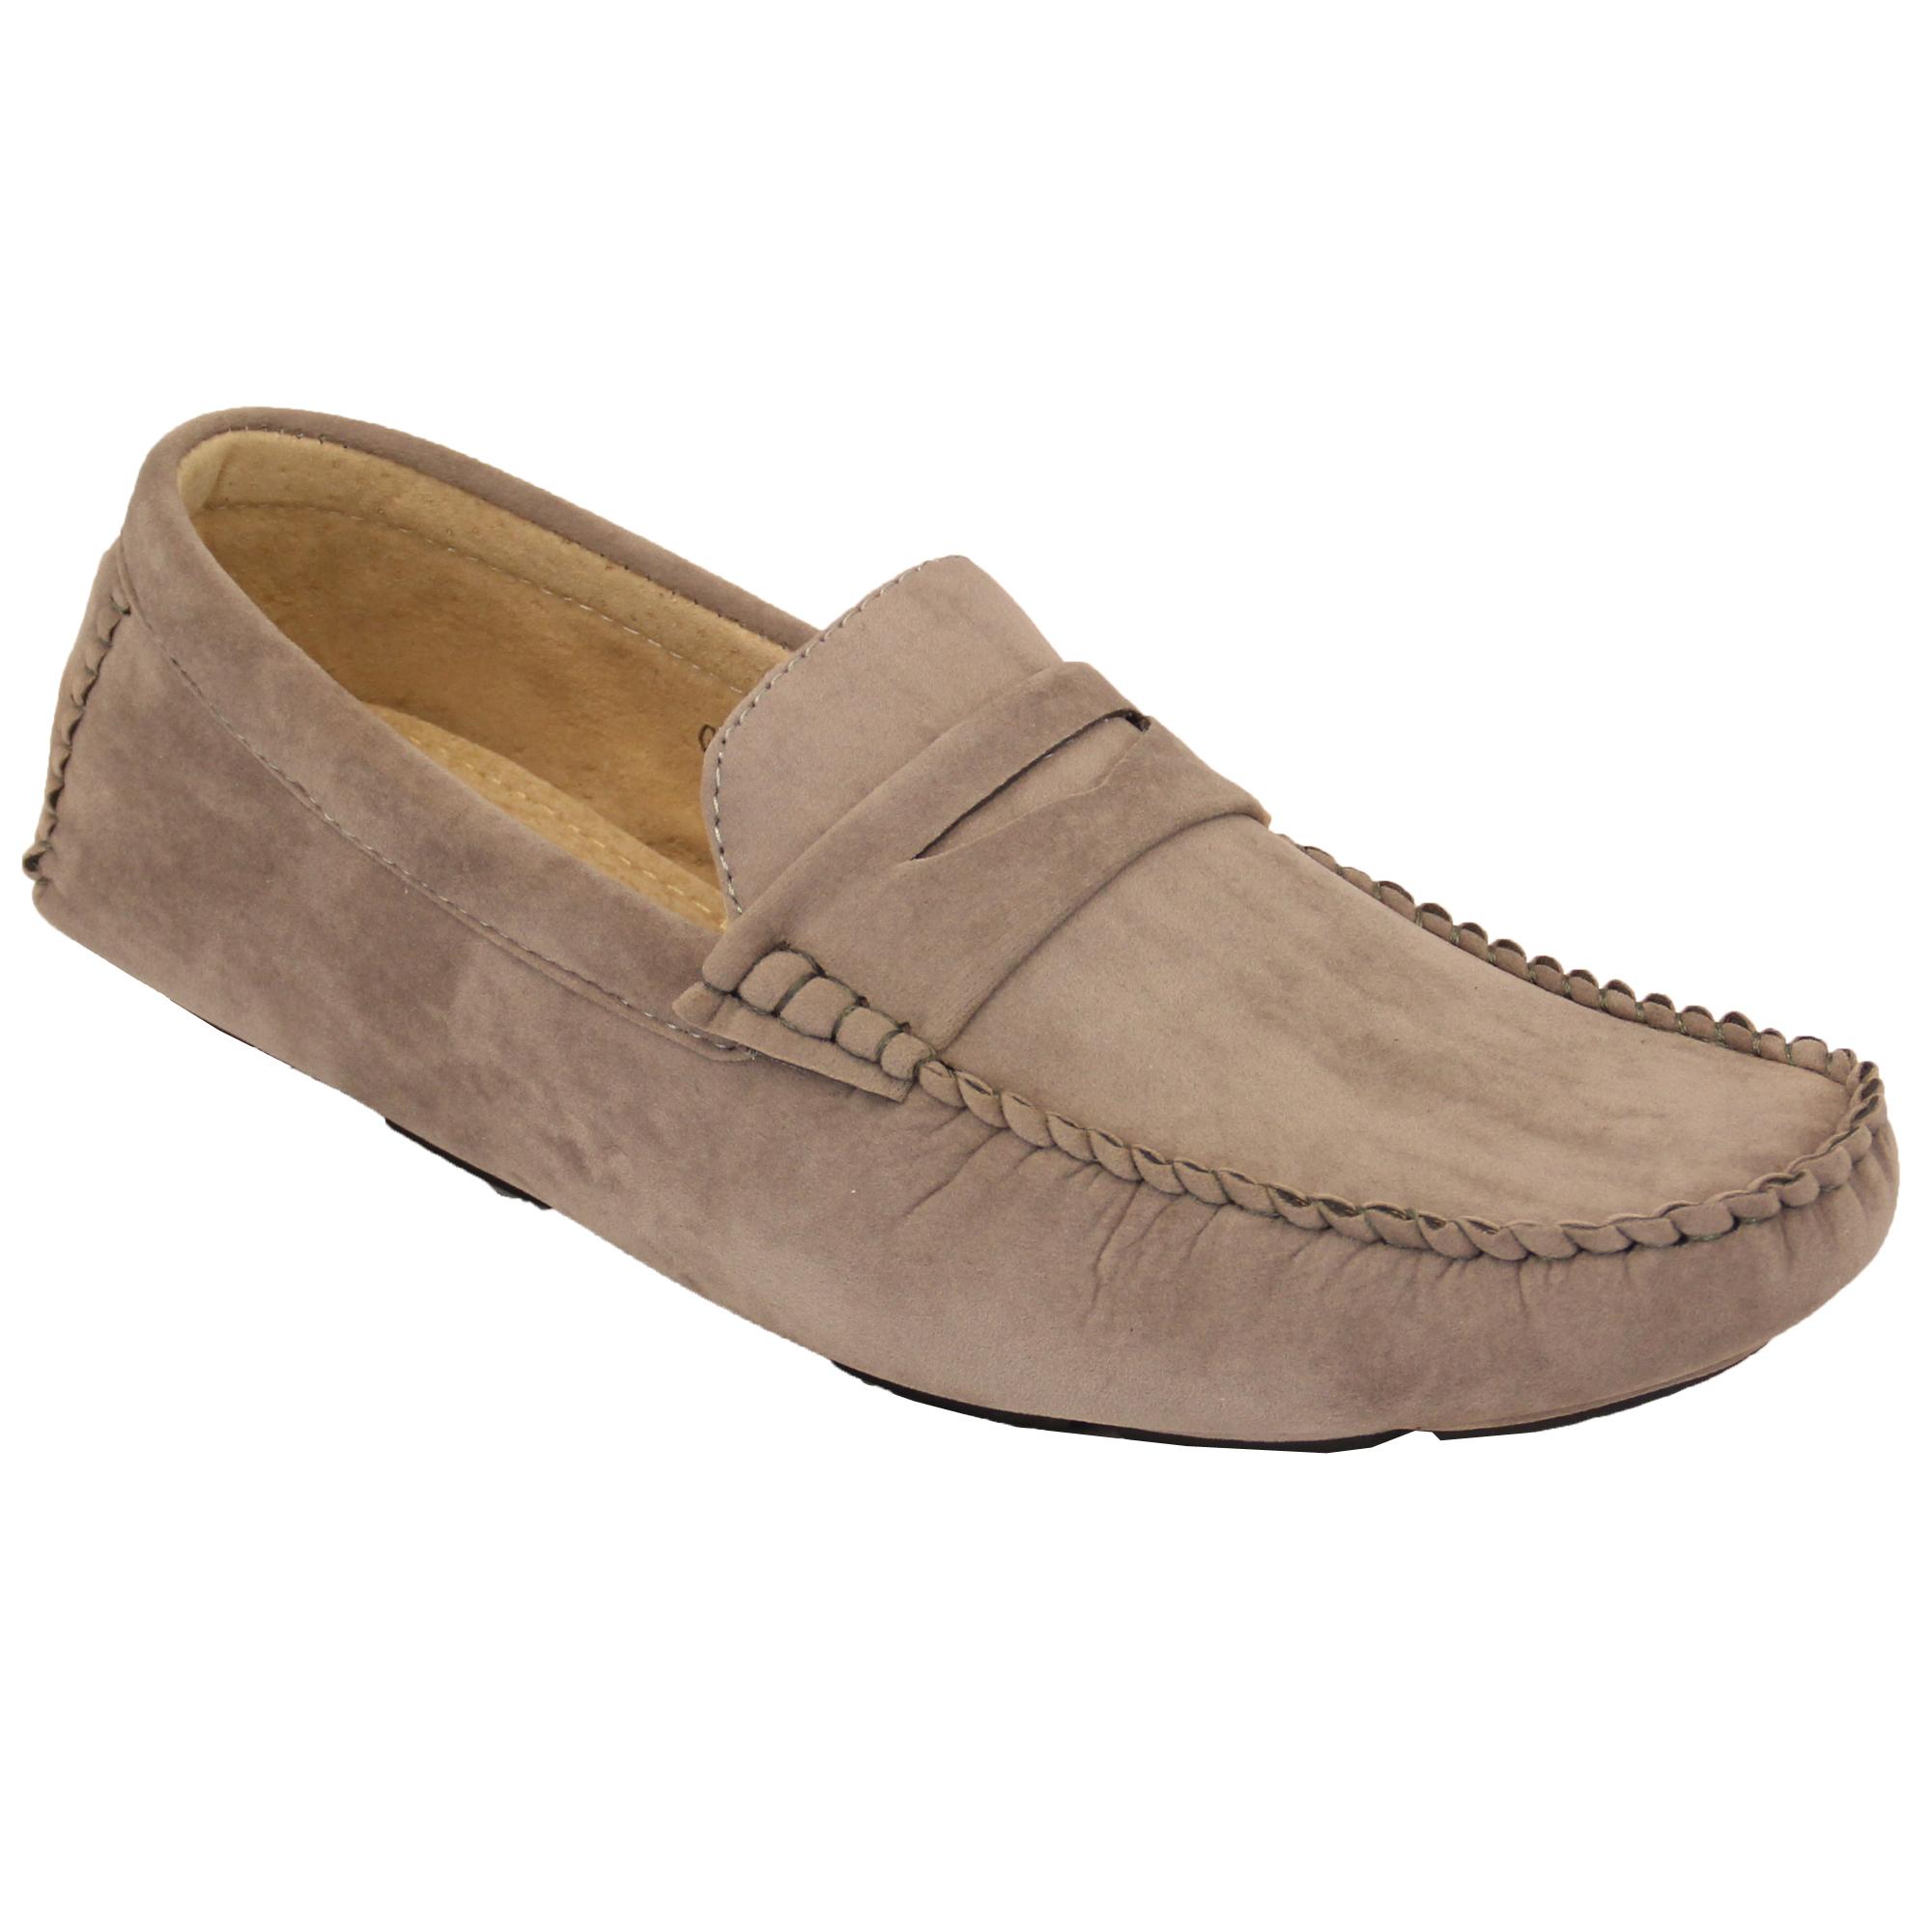 E Mens Sllip On Boat Shoes